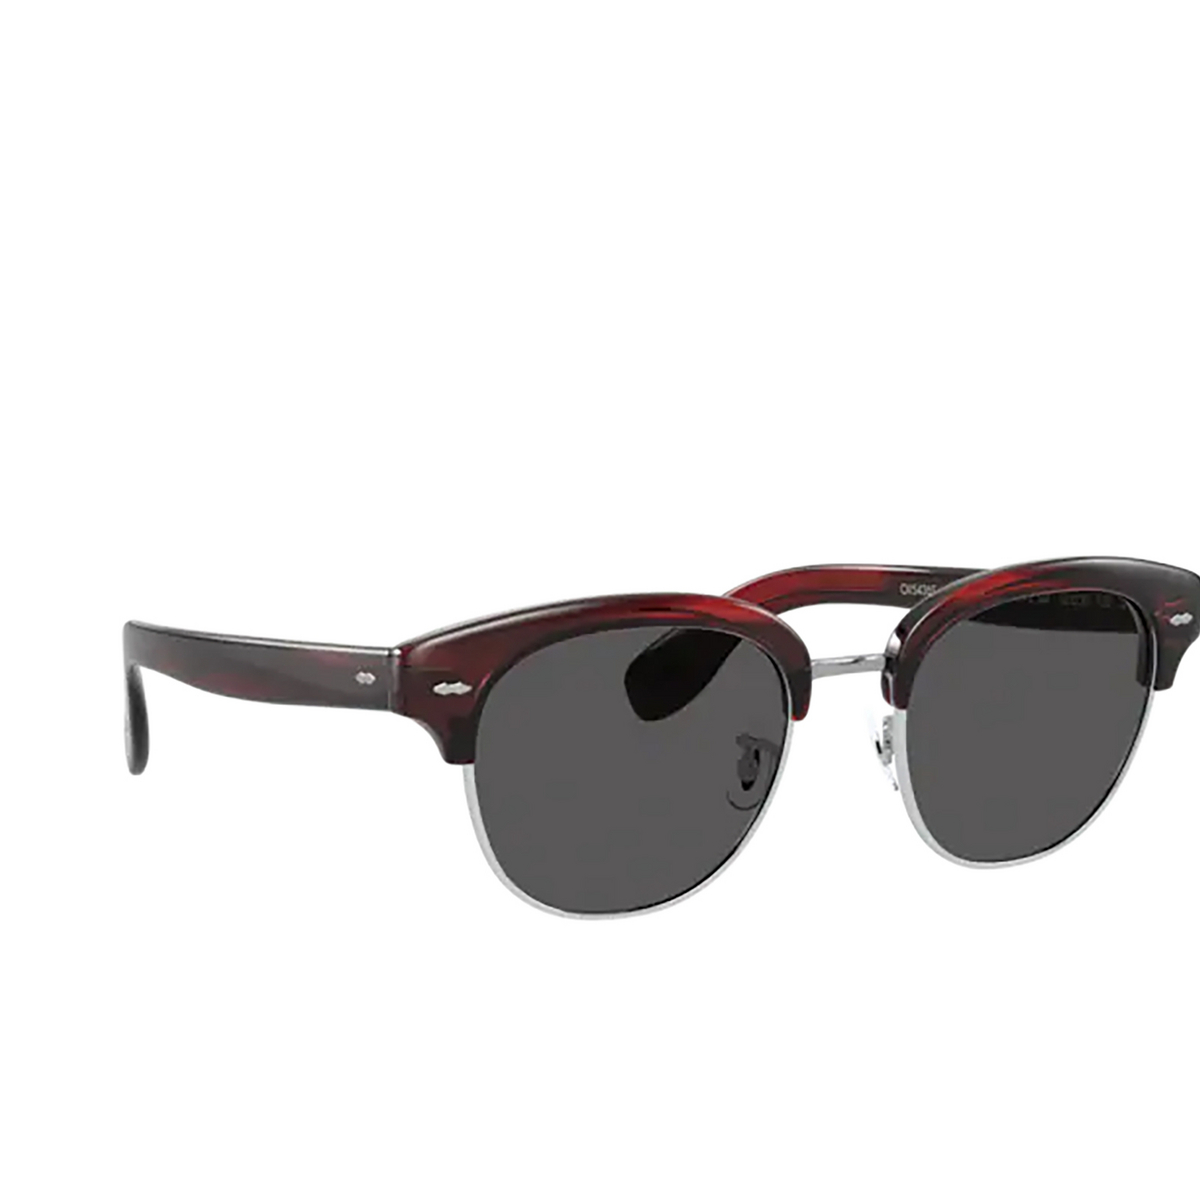 Oliver Peoples® Square Sunglasses: Cary Grant 2 Sun OV5436S color Bordeaux Bark 1675R5.